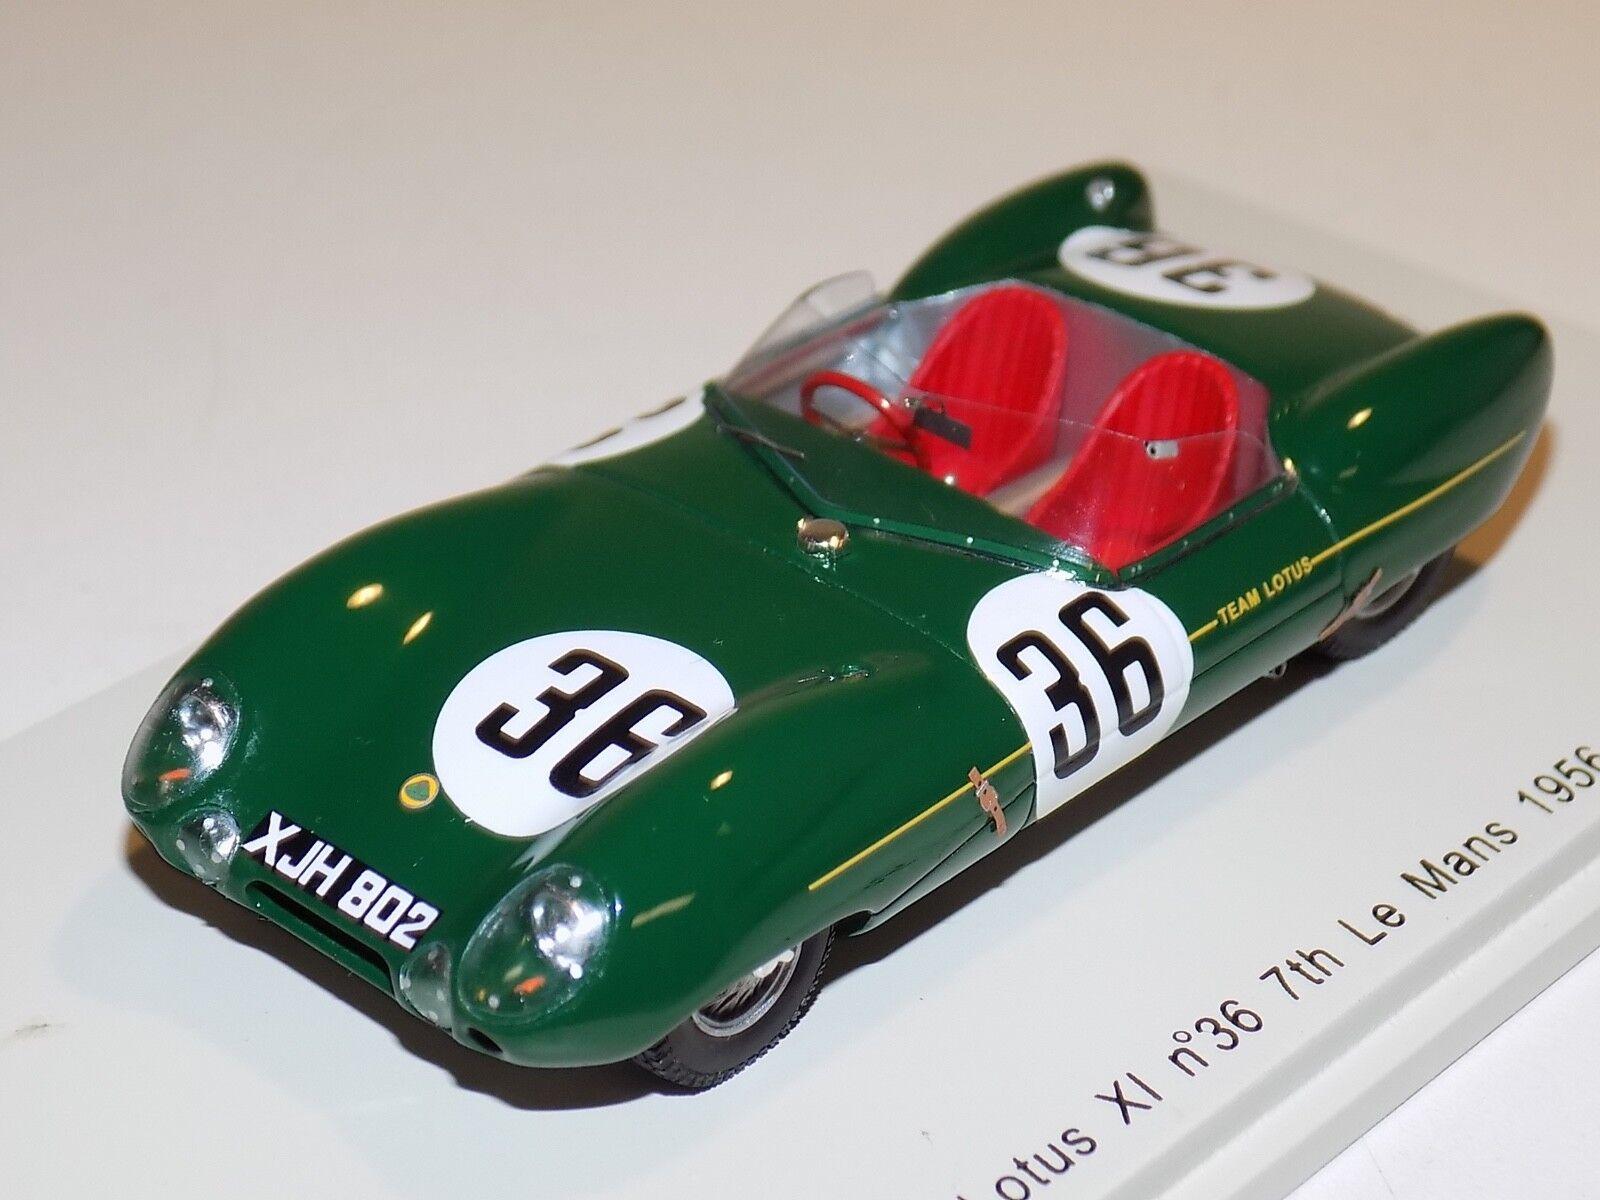 1 43 Spark Lotus XI  Car  36 24 H Lemans 1956  S2188